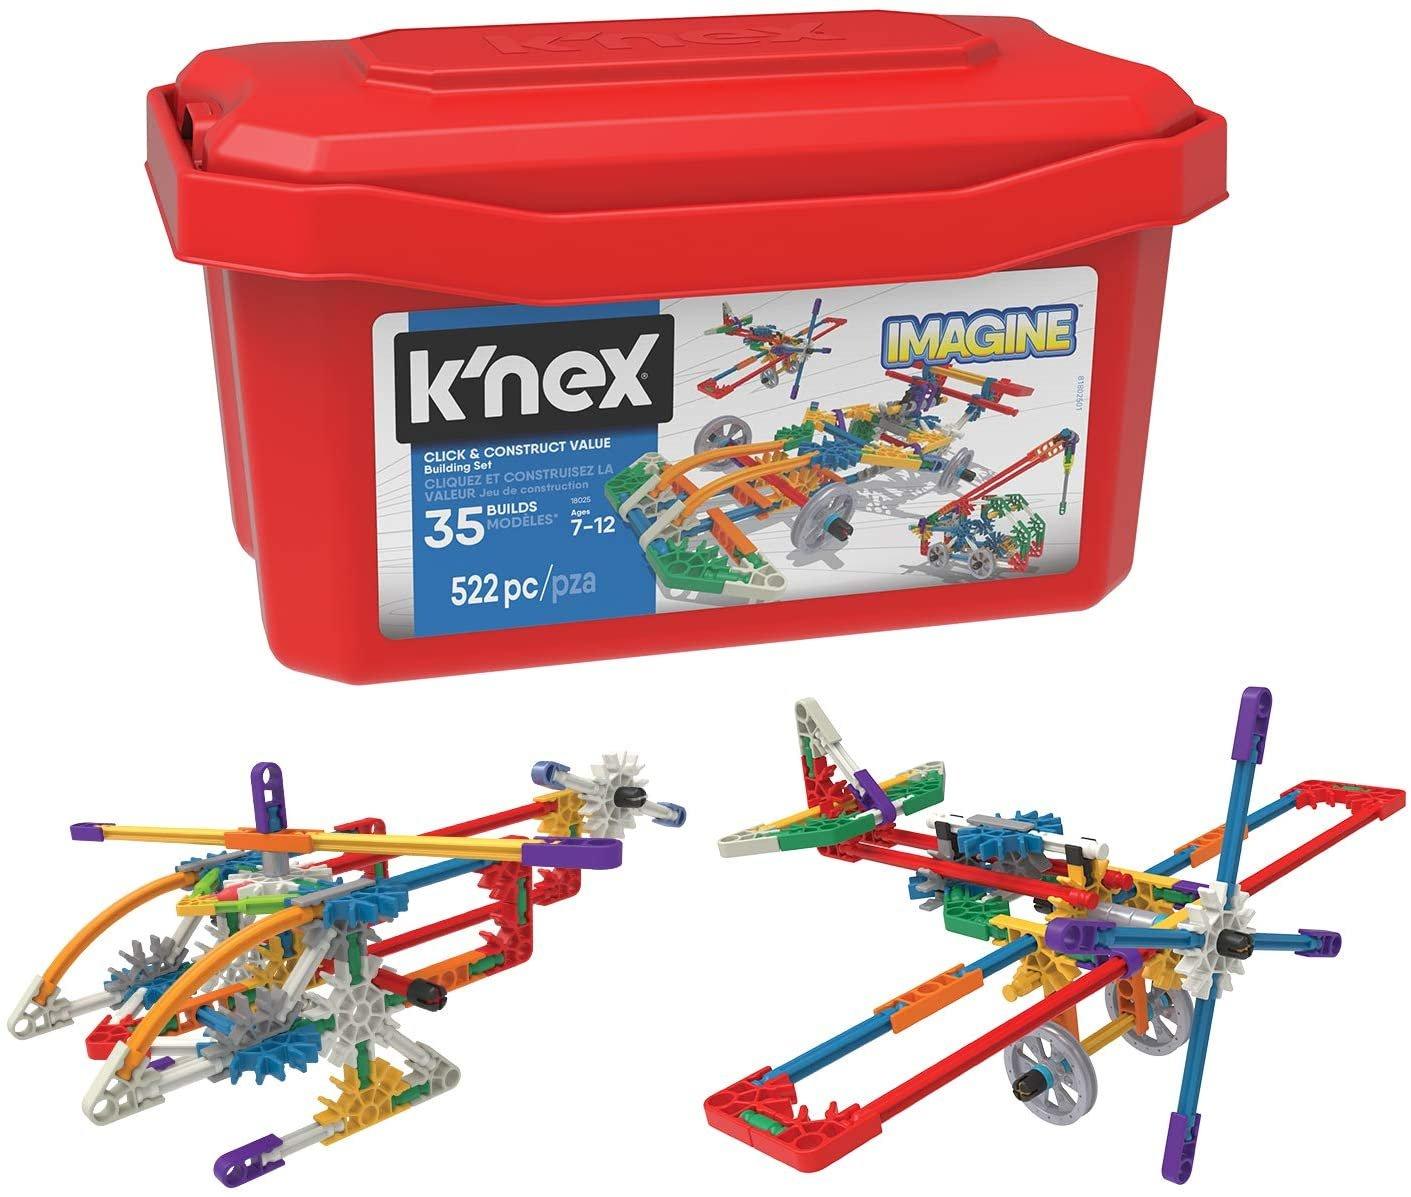 K'NEX Imagine - Click & Construct Value Building Set - 522Piece - 35 Models -